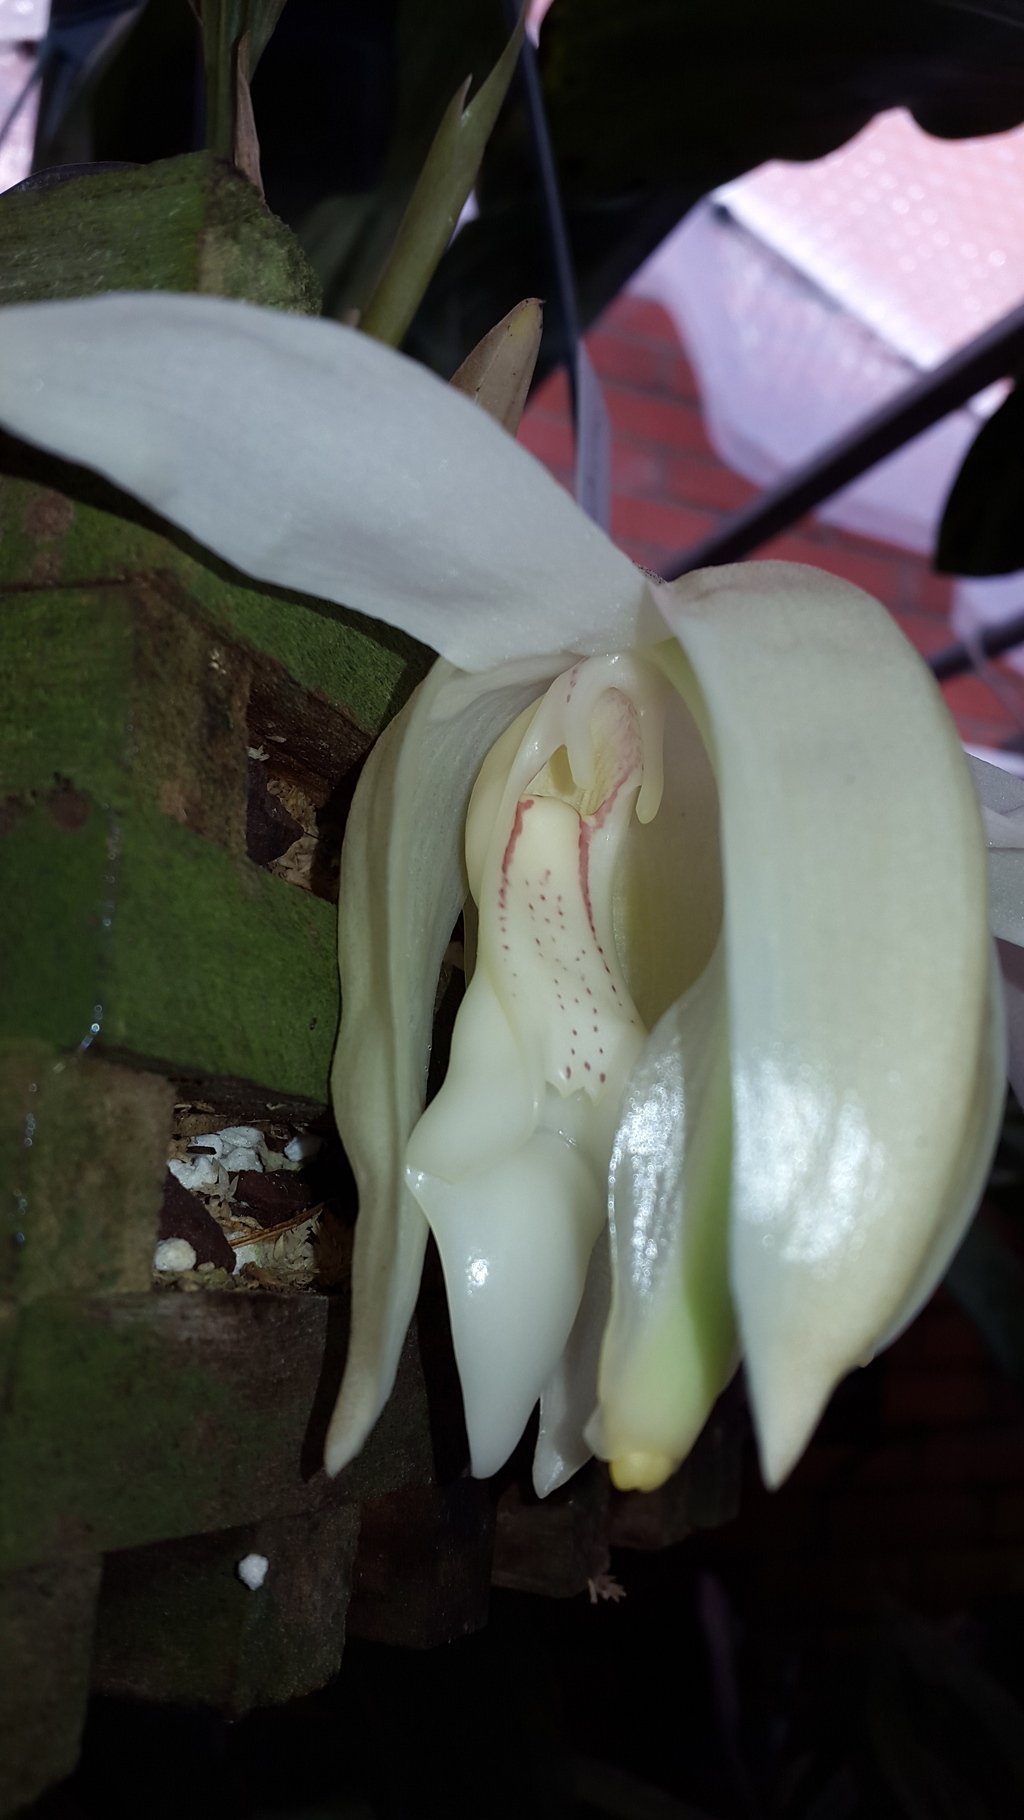 Bluht jetzt, stanhopea grandiflora 20151025_142611_zpssbj8ficy